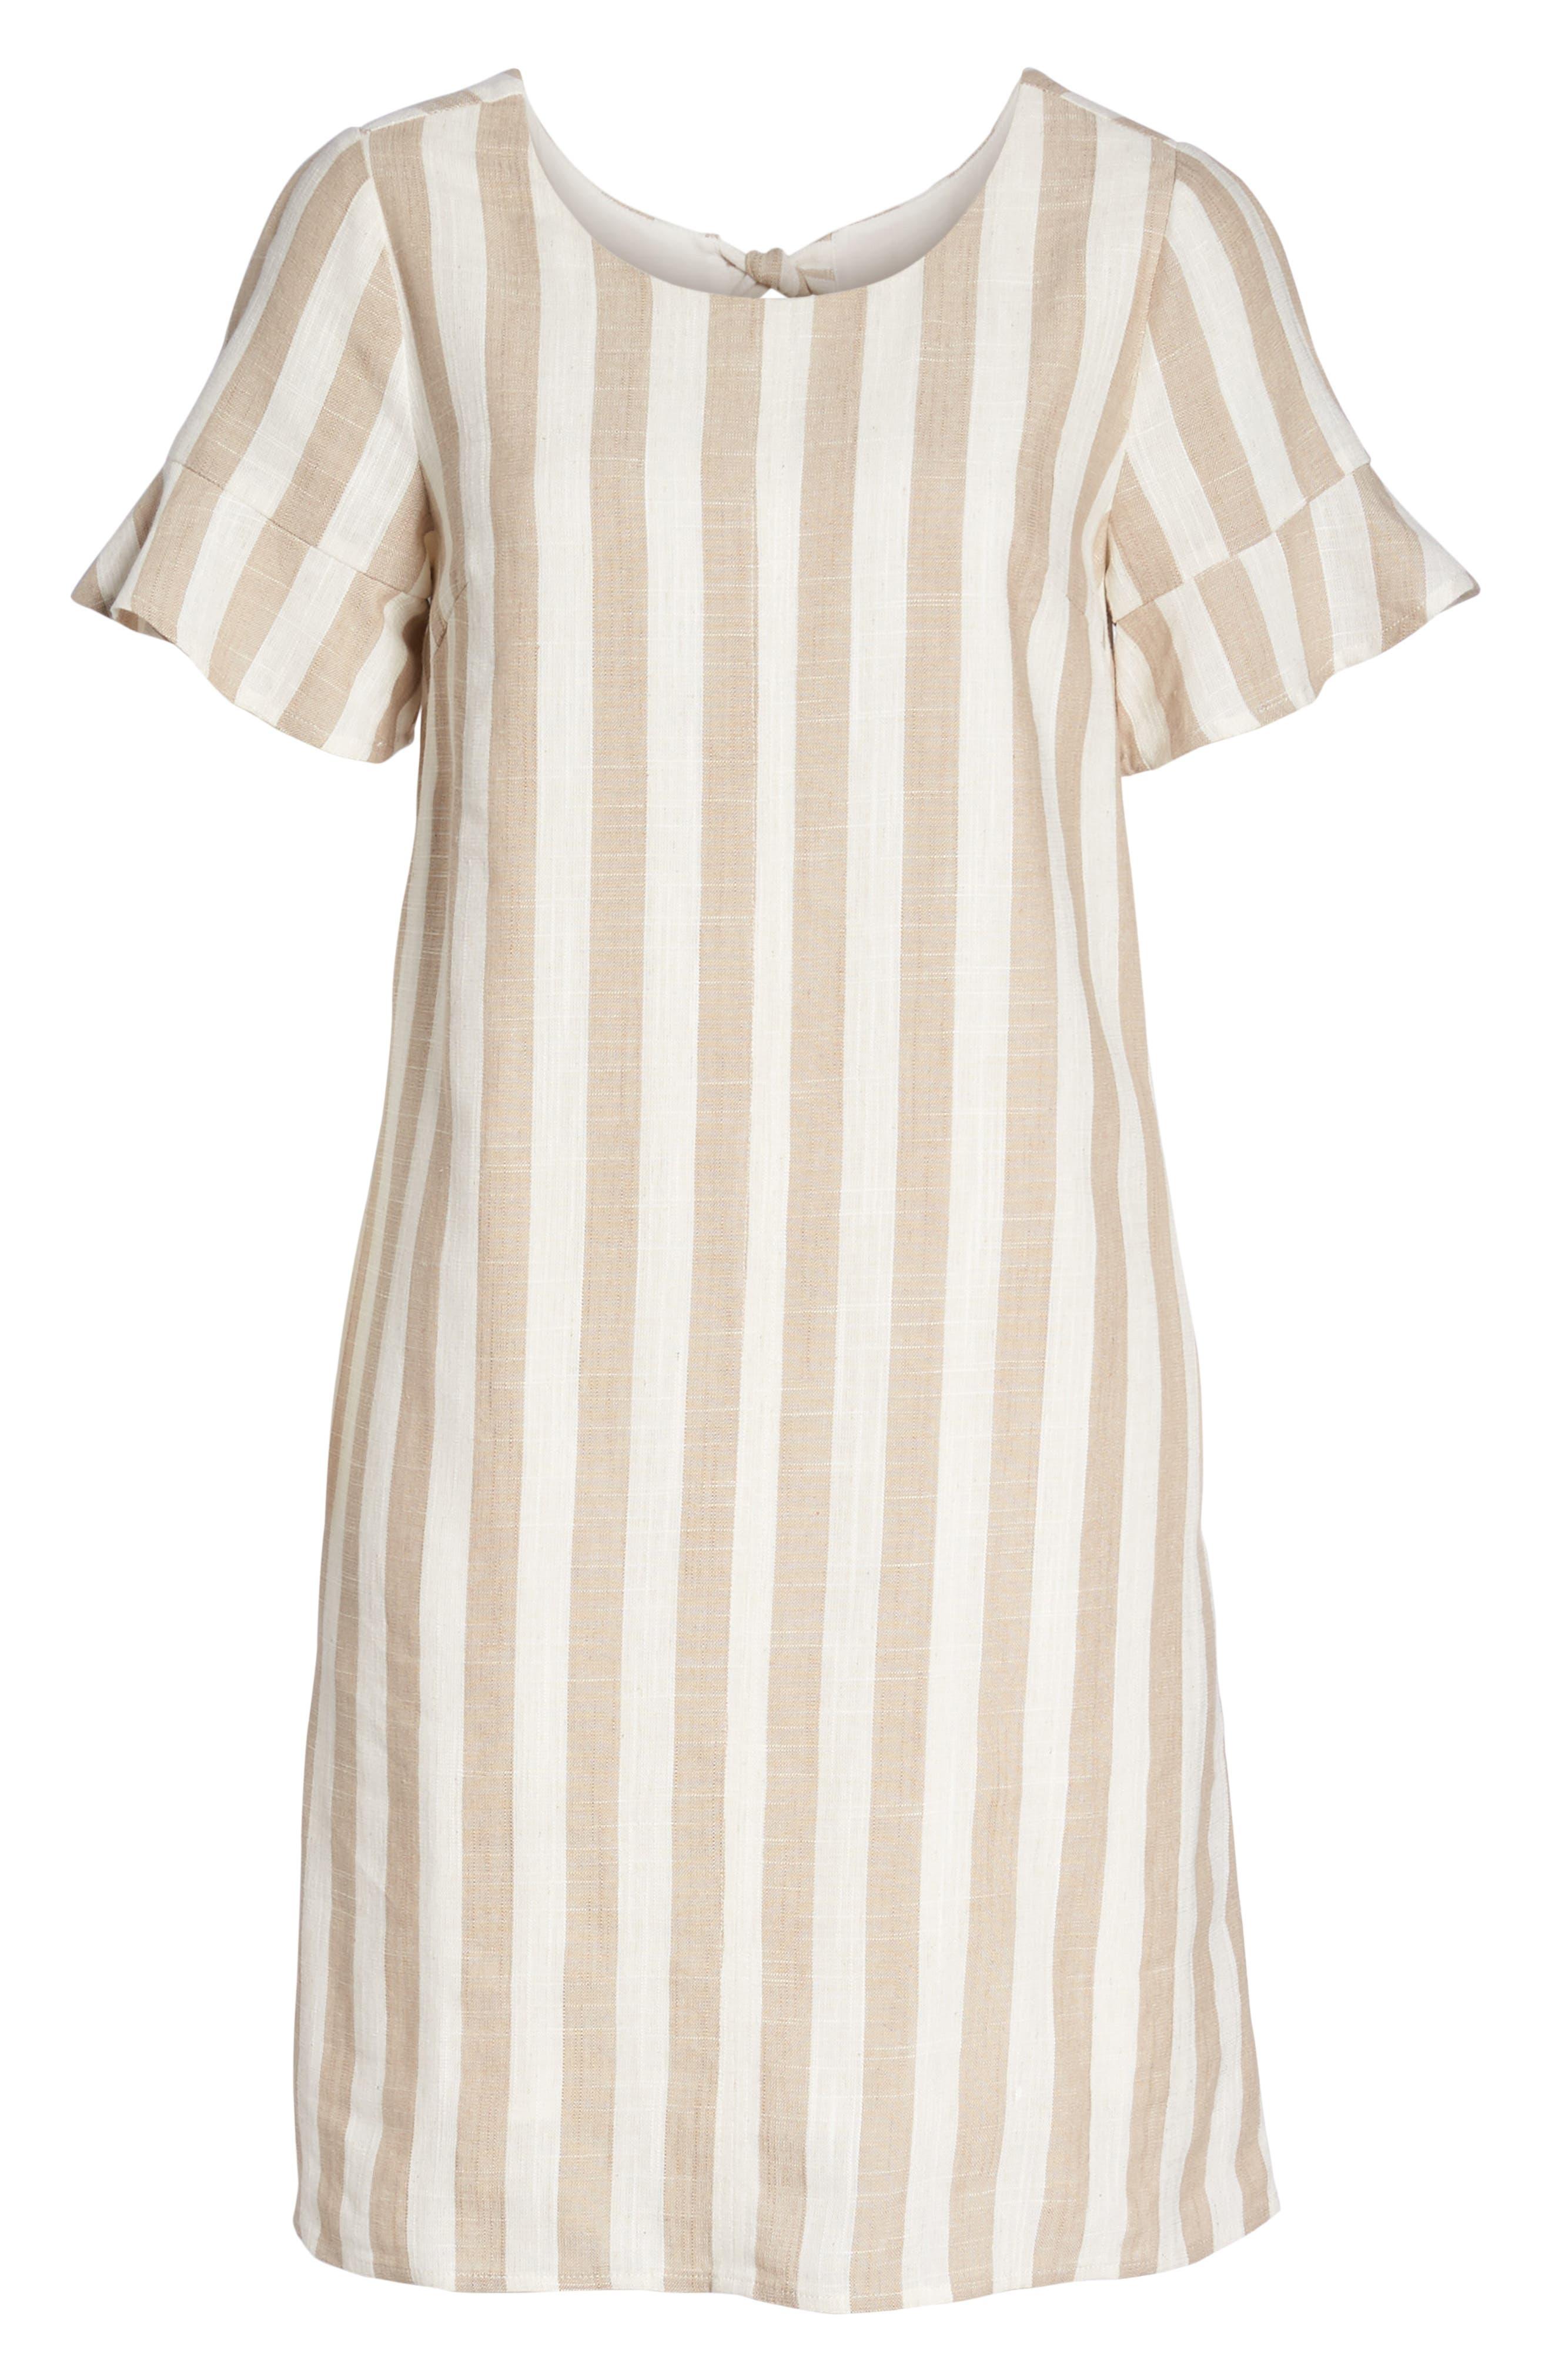 Back Tie Detail Shift Dress,                             Alternate thumbnail 7, color,                             250